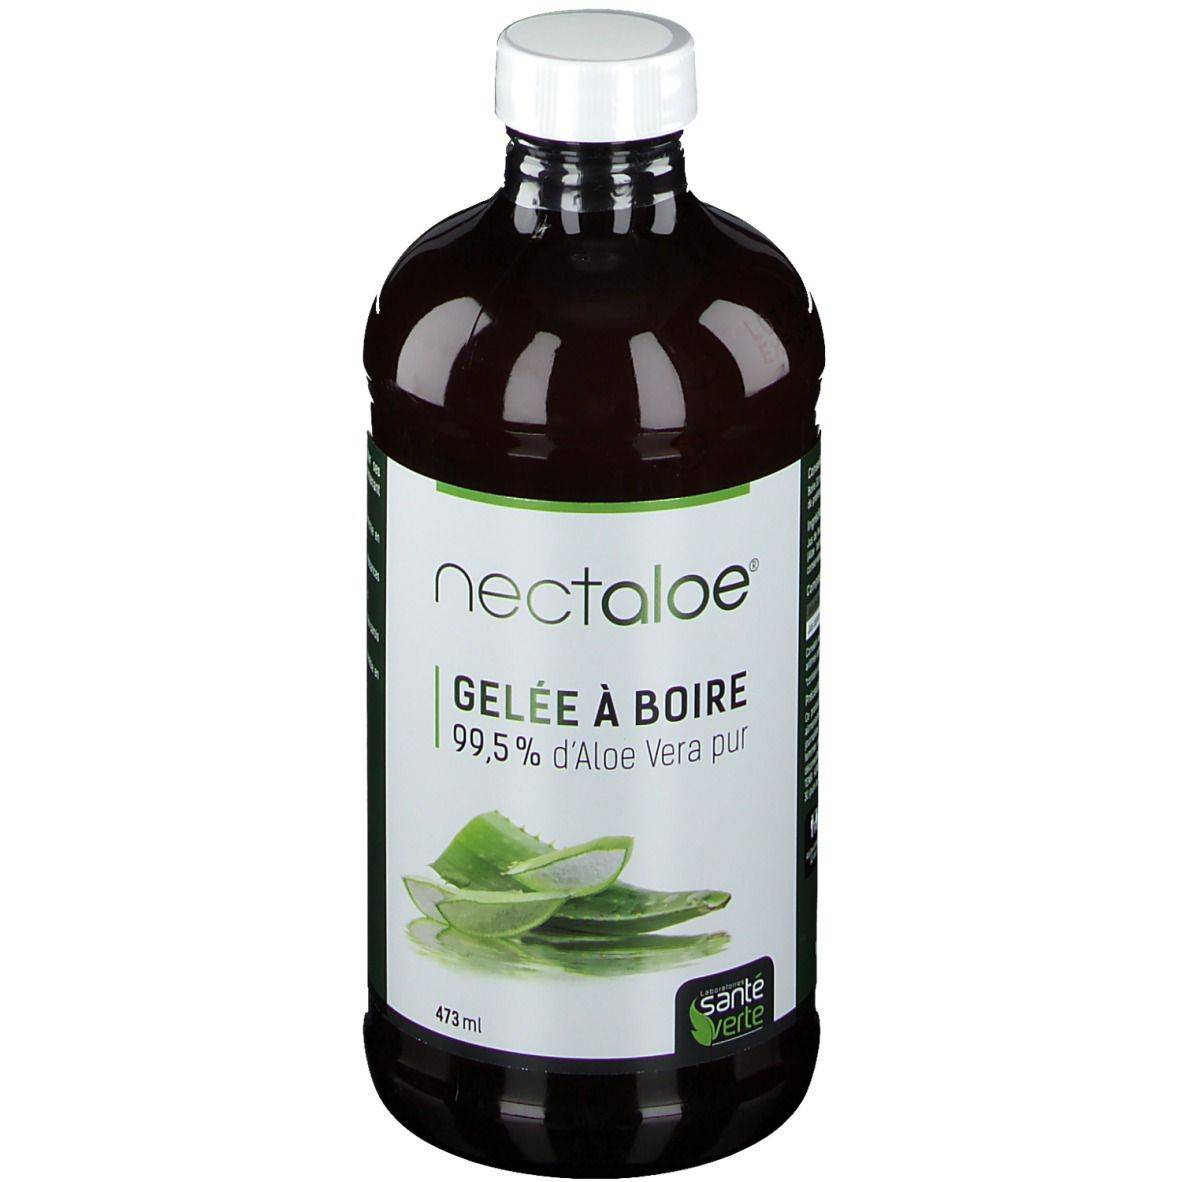 nectaloe® Santé Verte nectaloe® Gelée à boire ml gel(s)